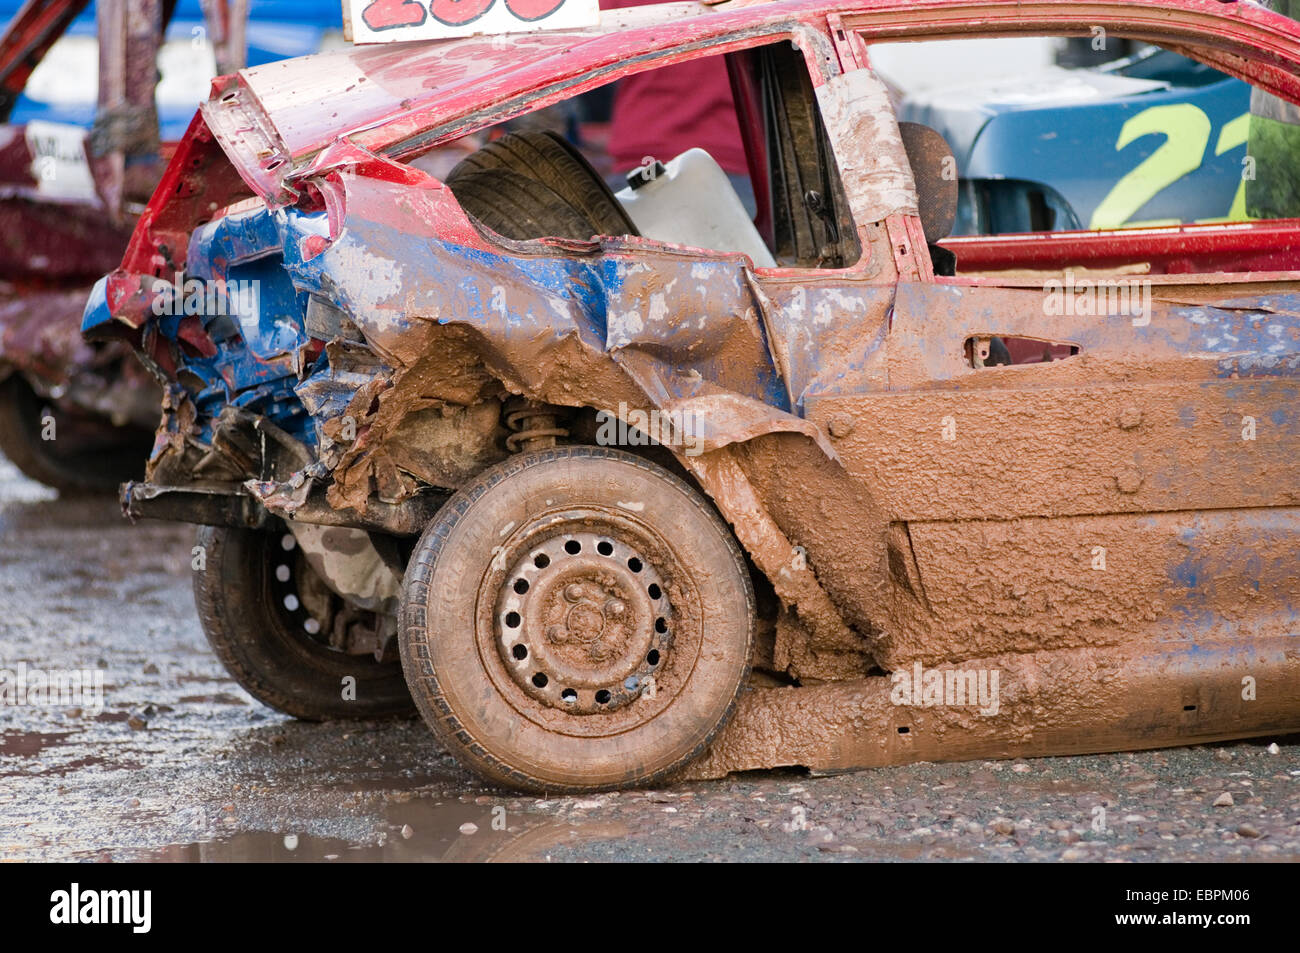 whiplash whip lash claim claims injury accident rear end ended car cars crash crashes neck ache back injuries crashed - Stock Image